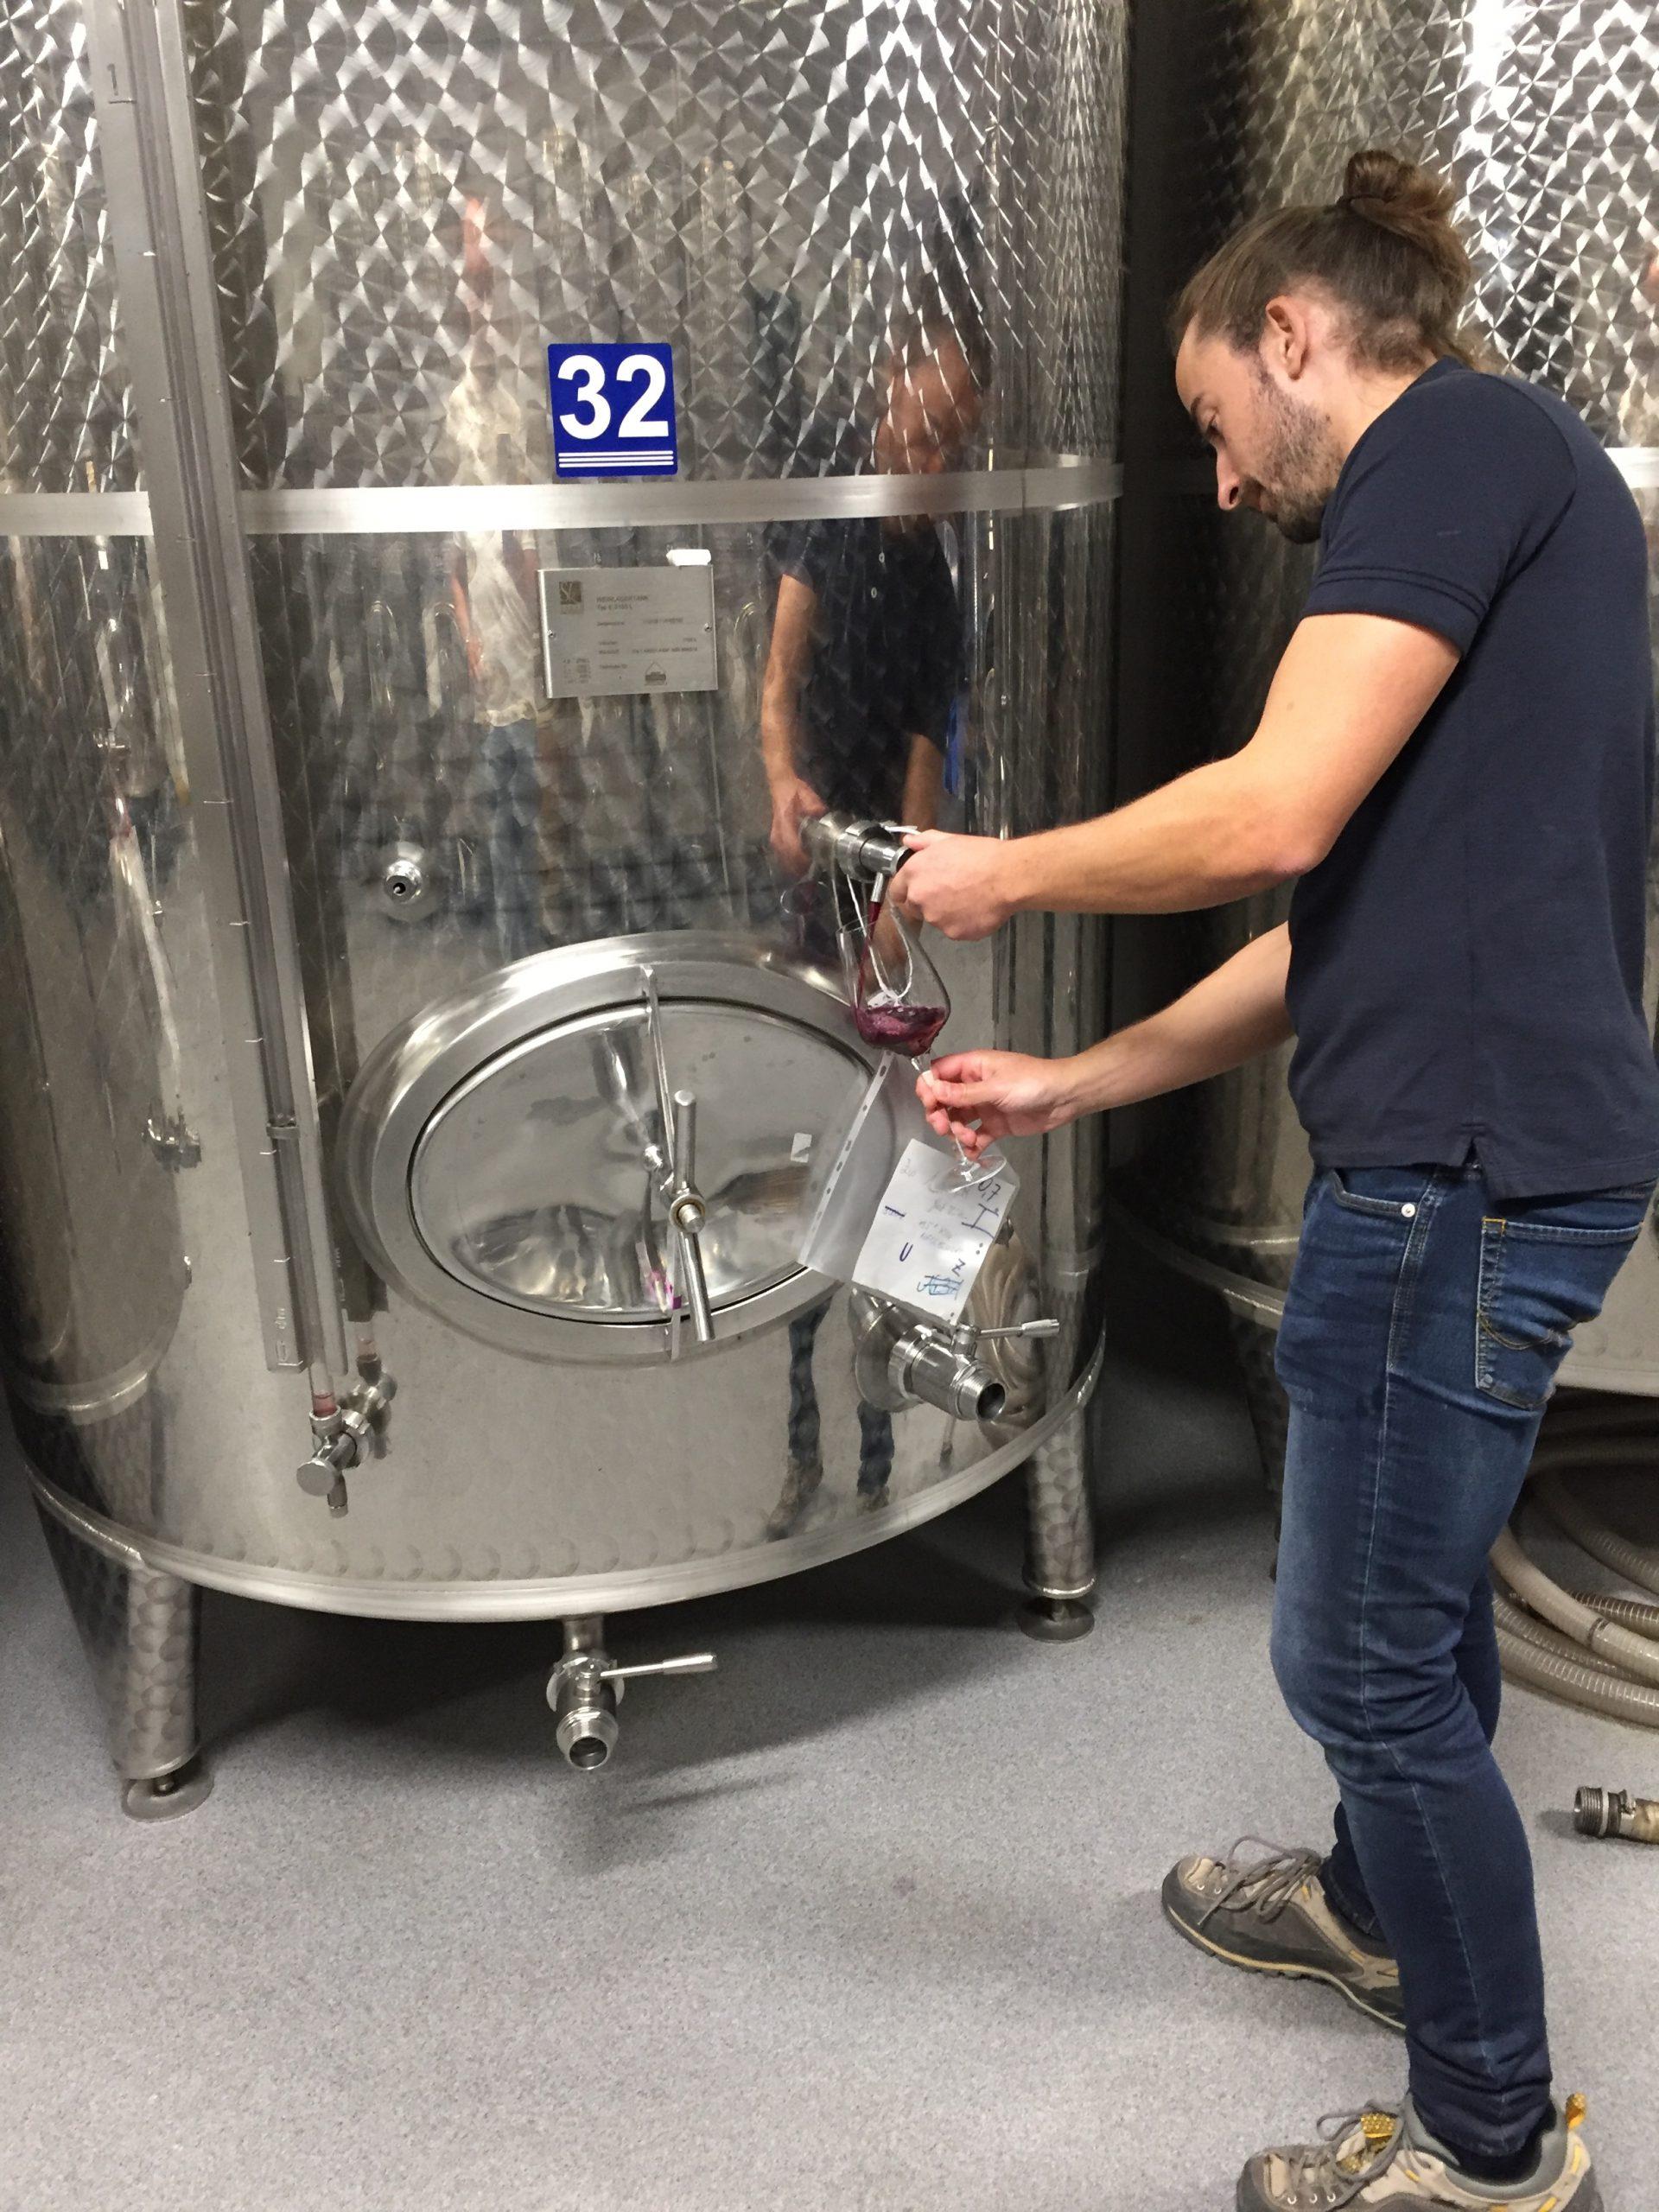 Weingut Mittelbach inox tasting